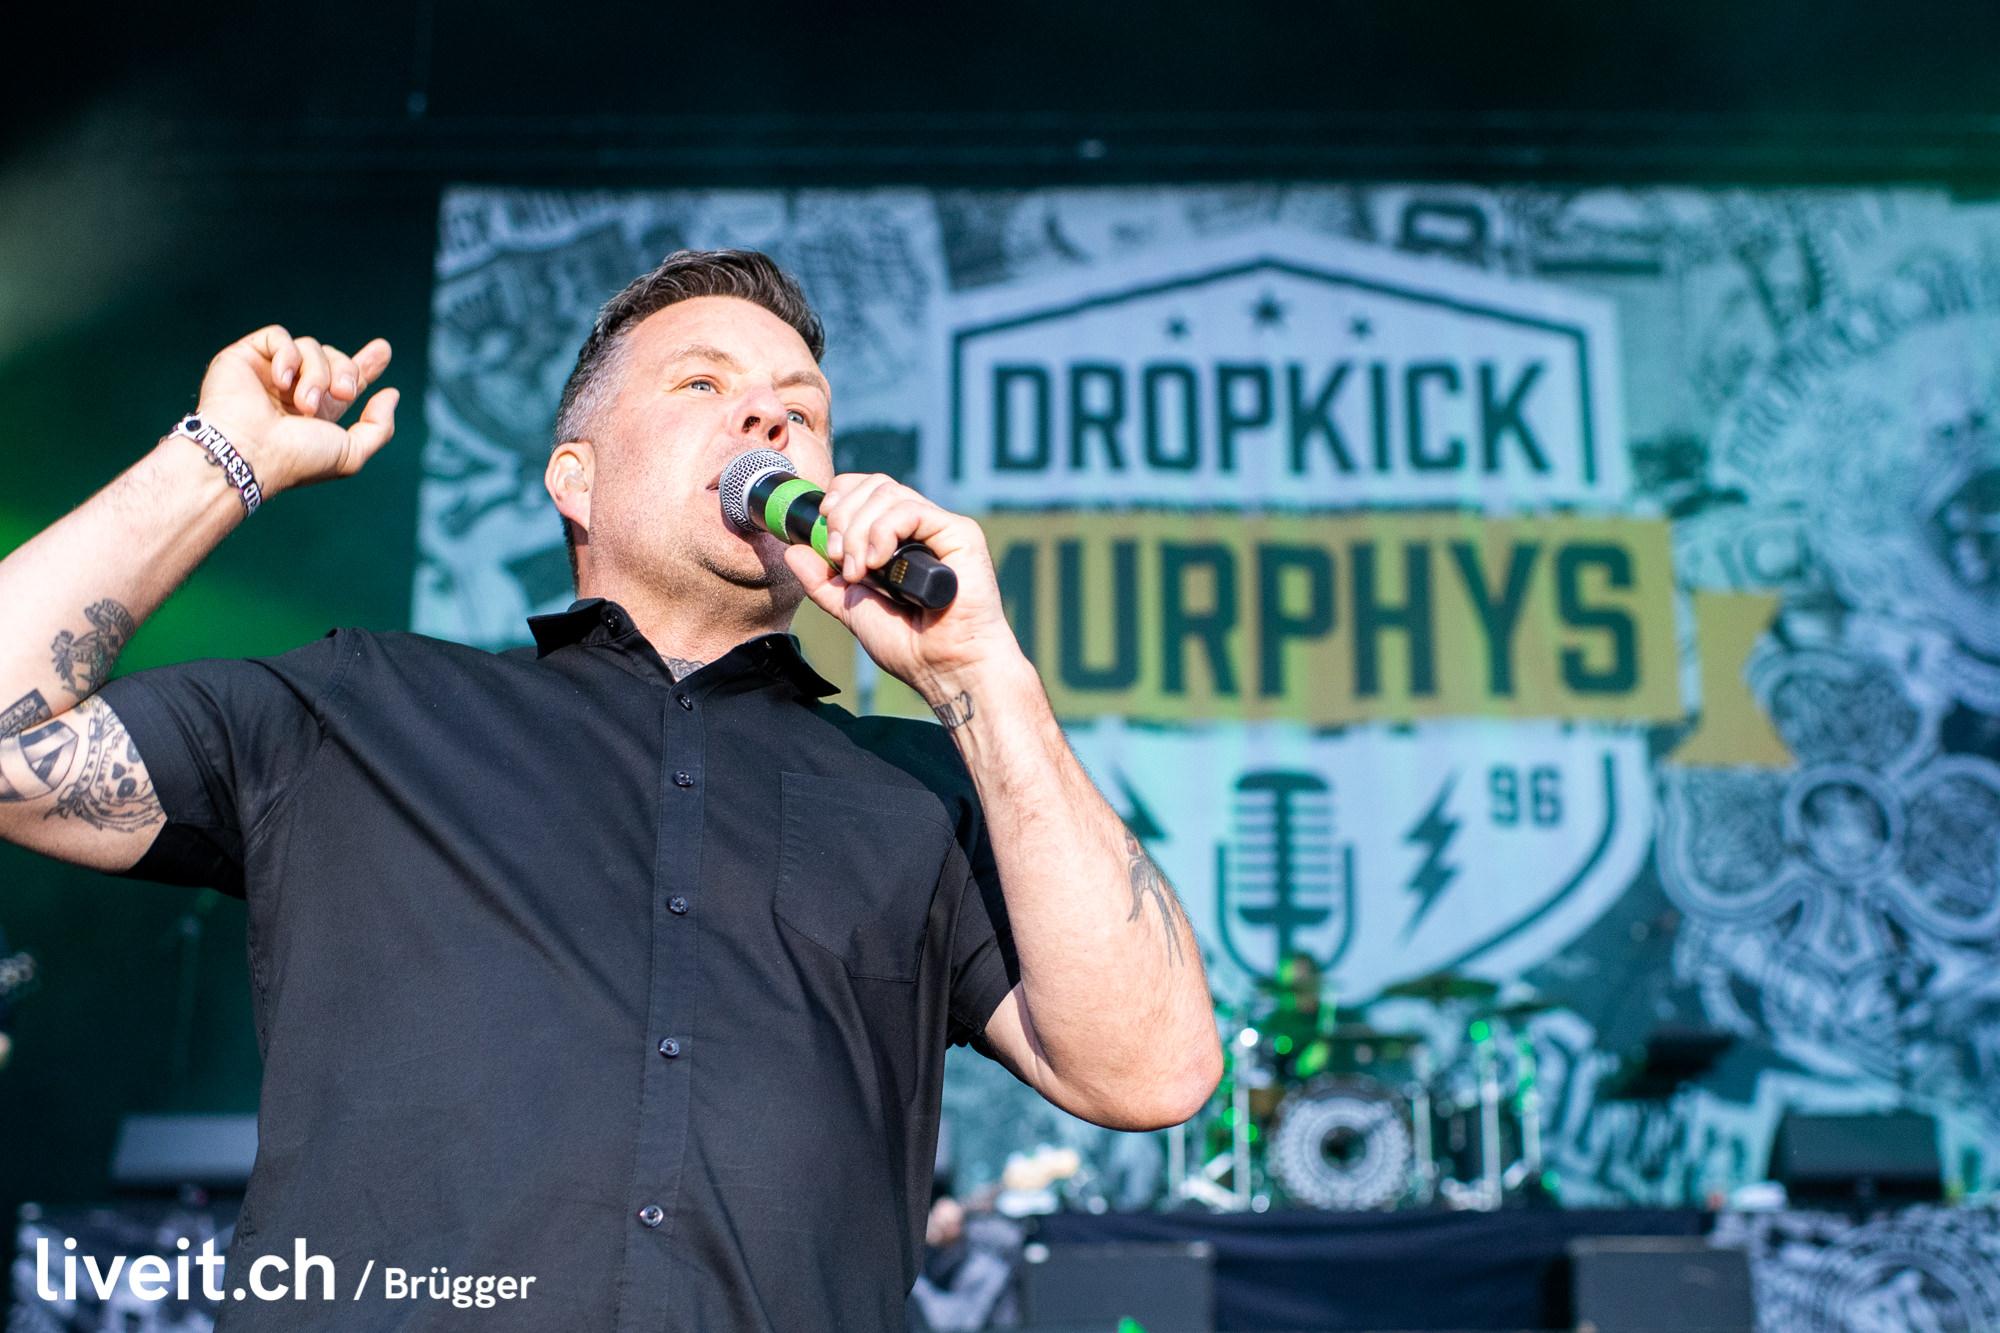 SCHWEIZ GREENFIELD FESTIVAL 2019 Dropkick Murphys